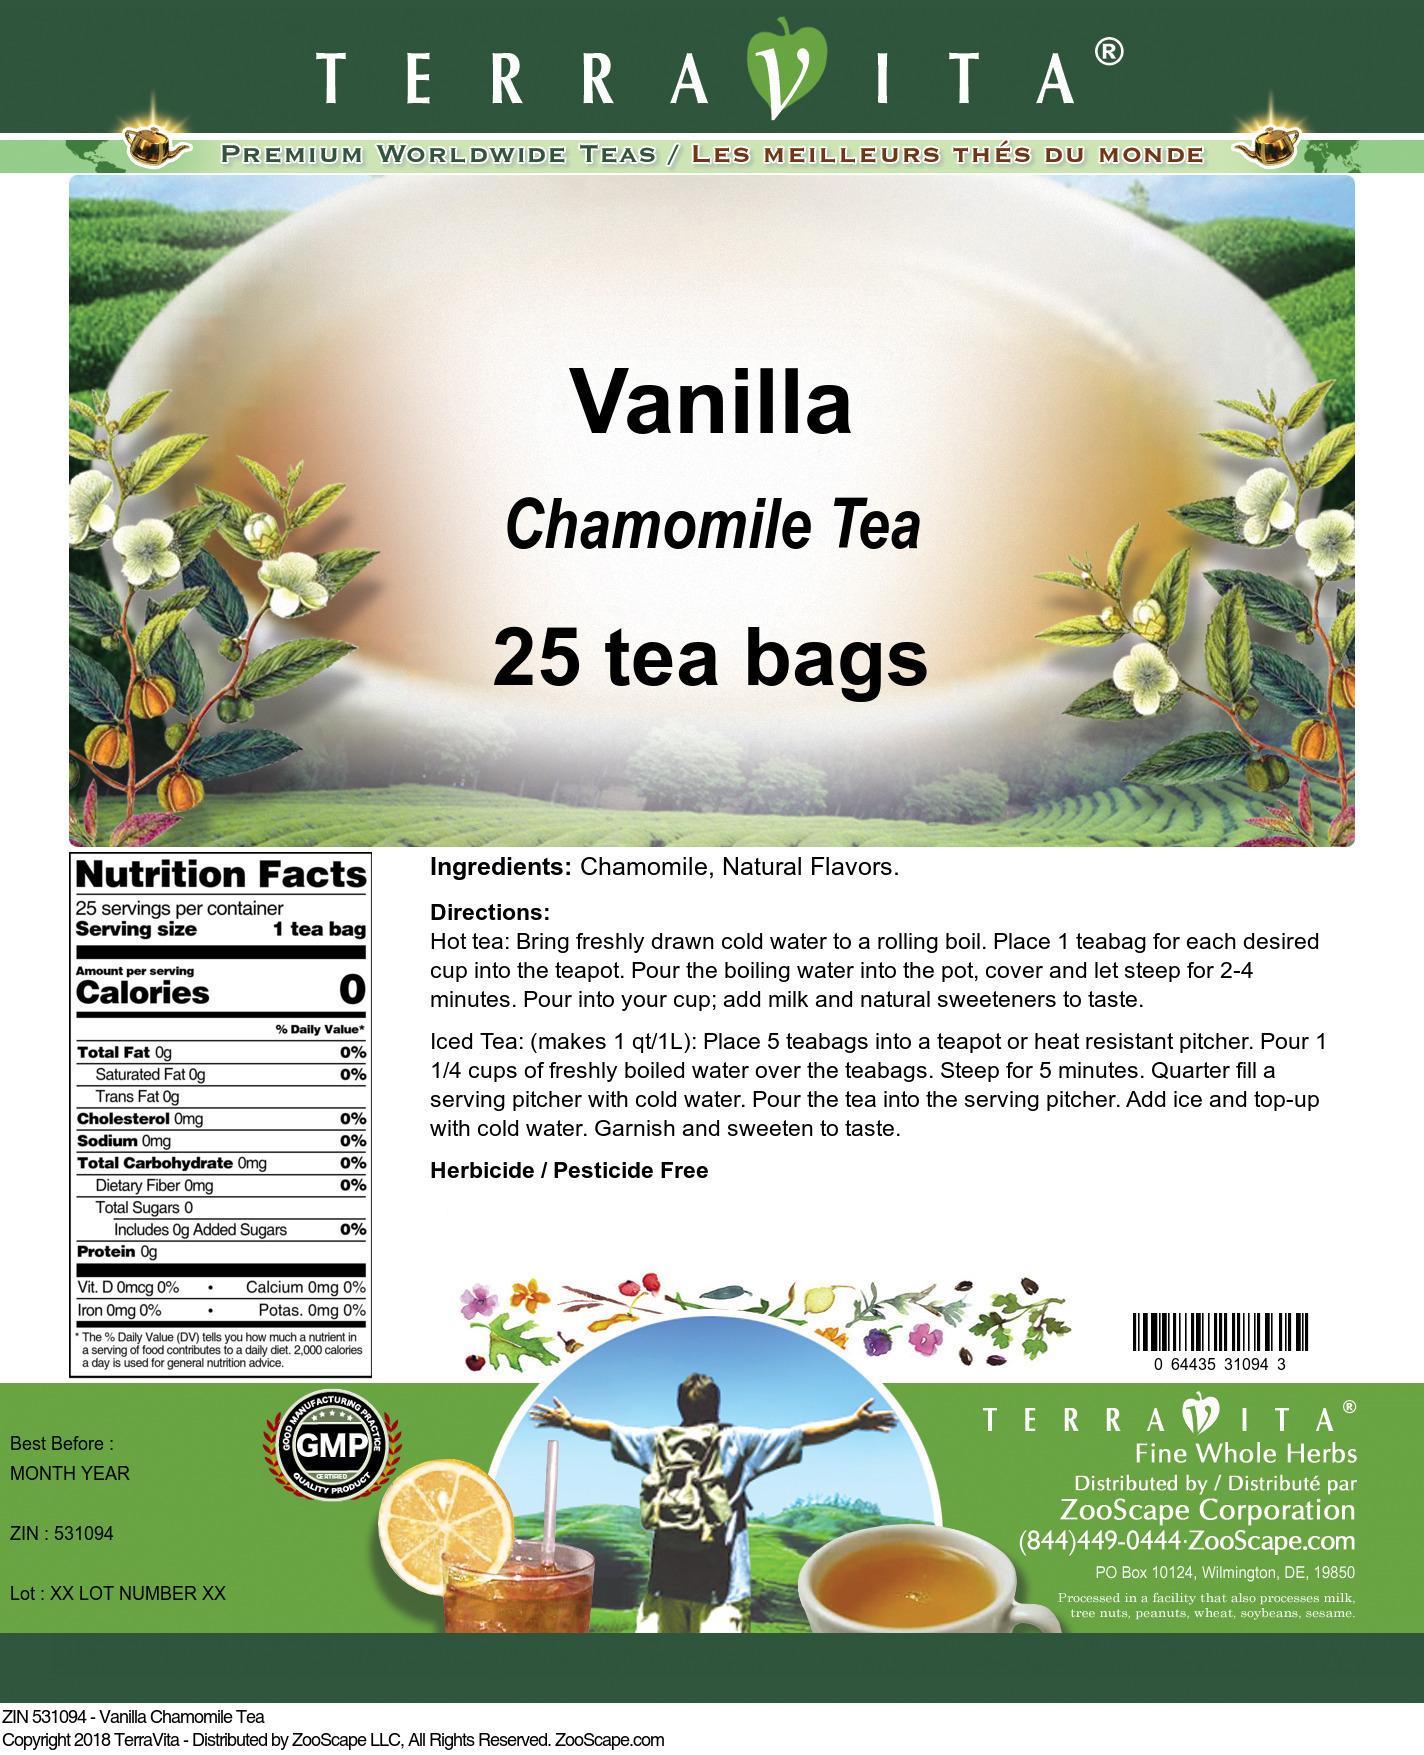 Vanilla Chamomile Tea